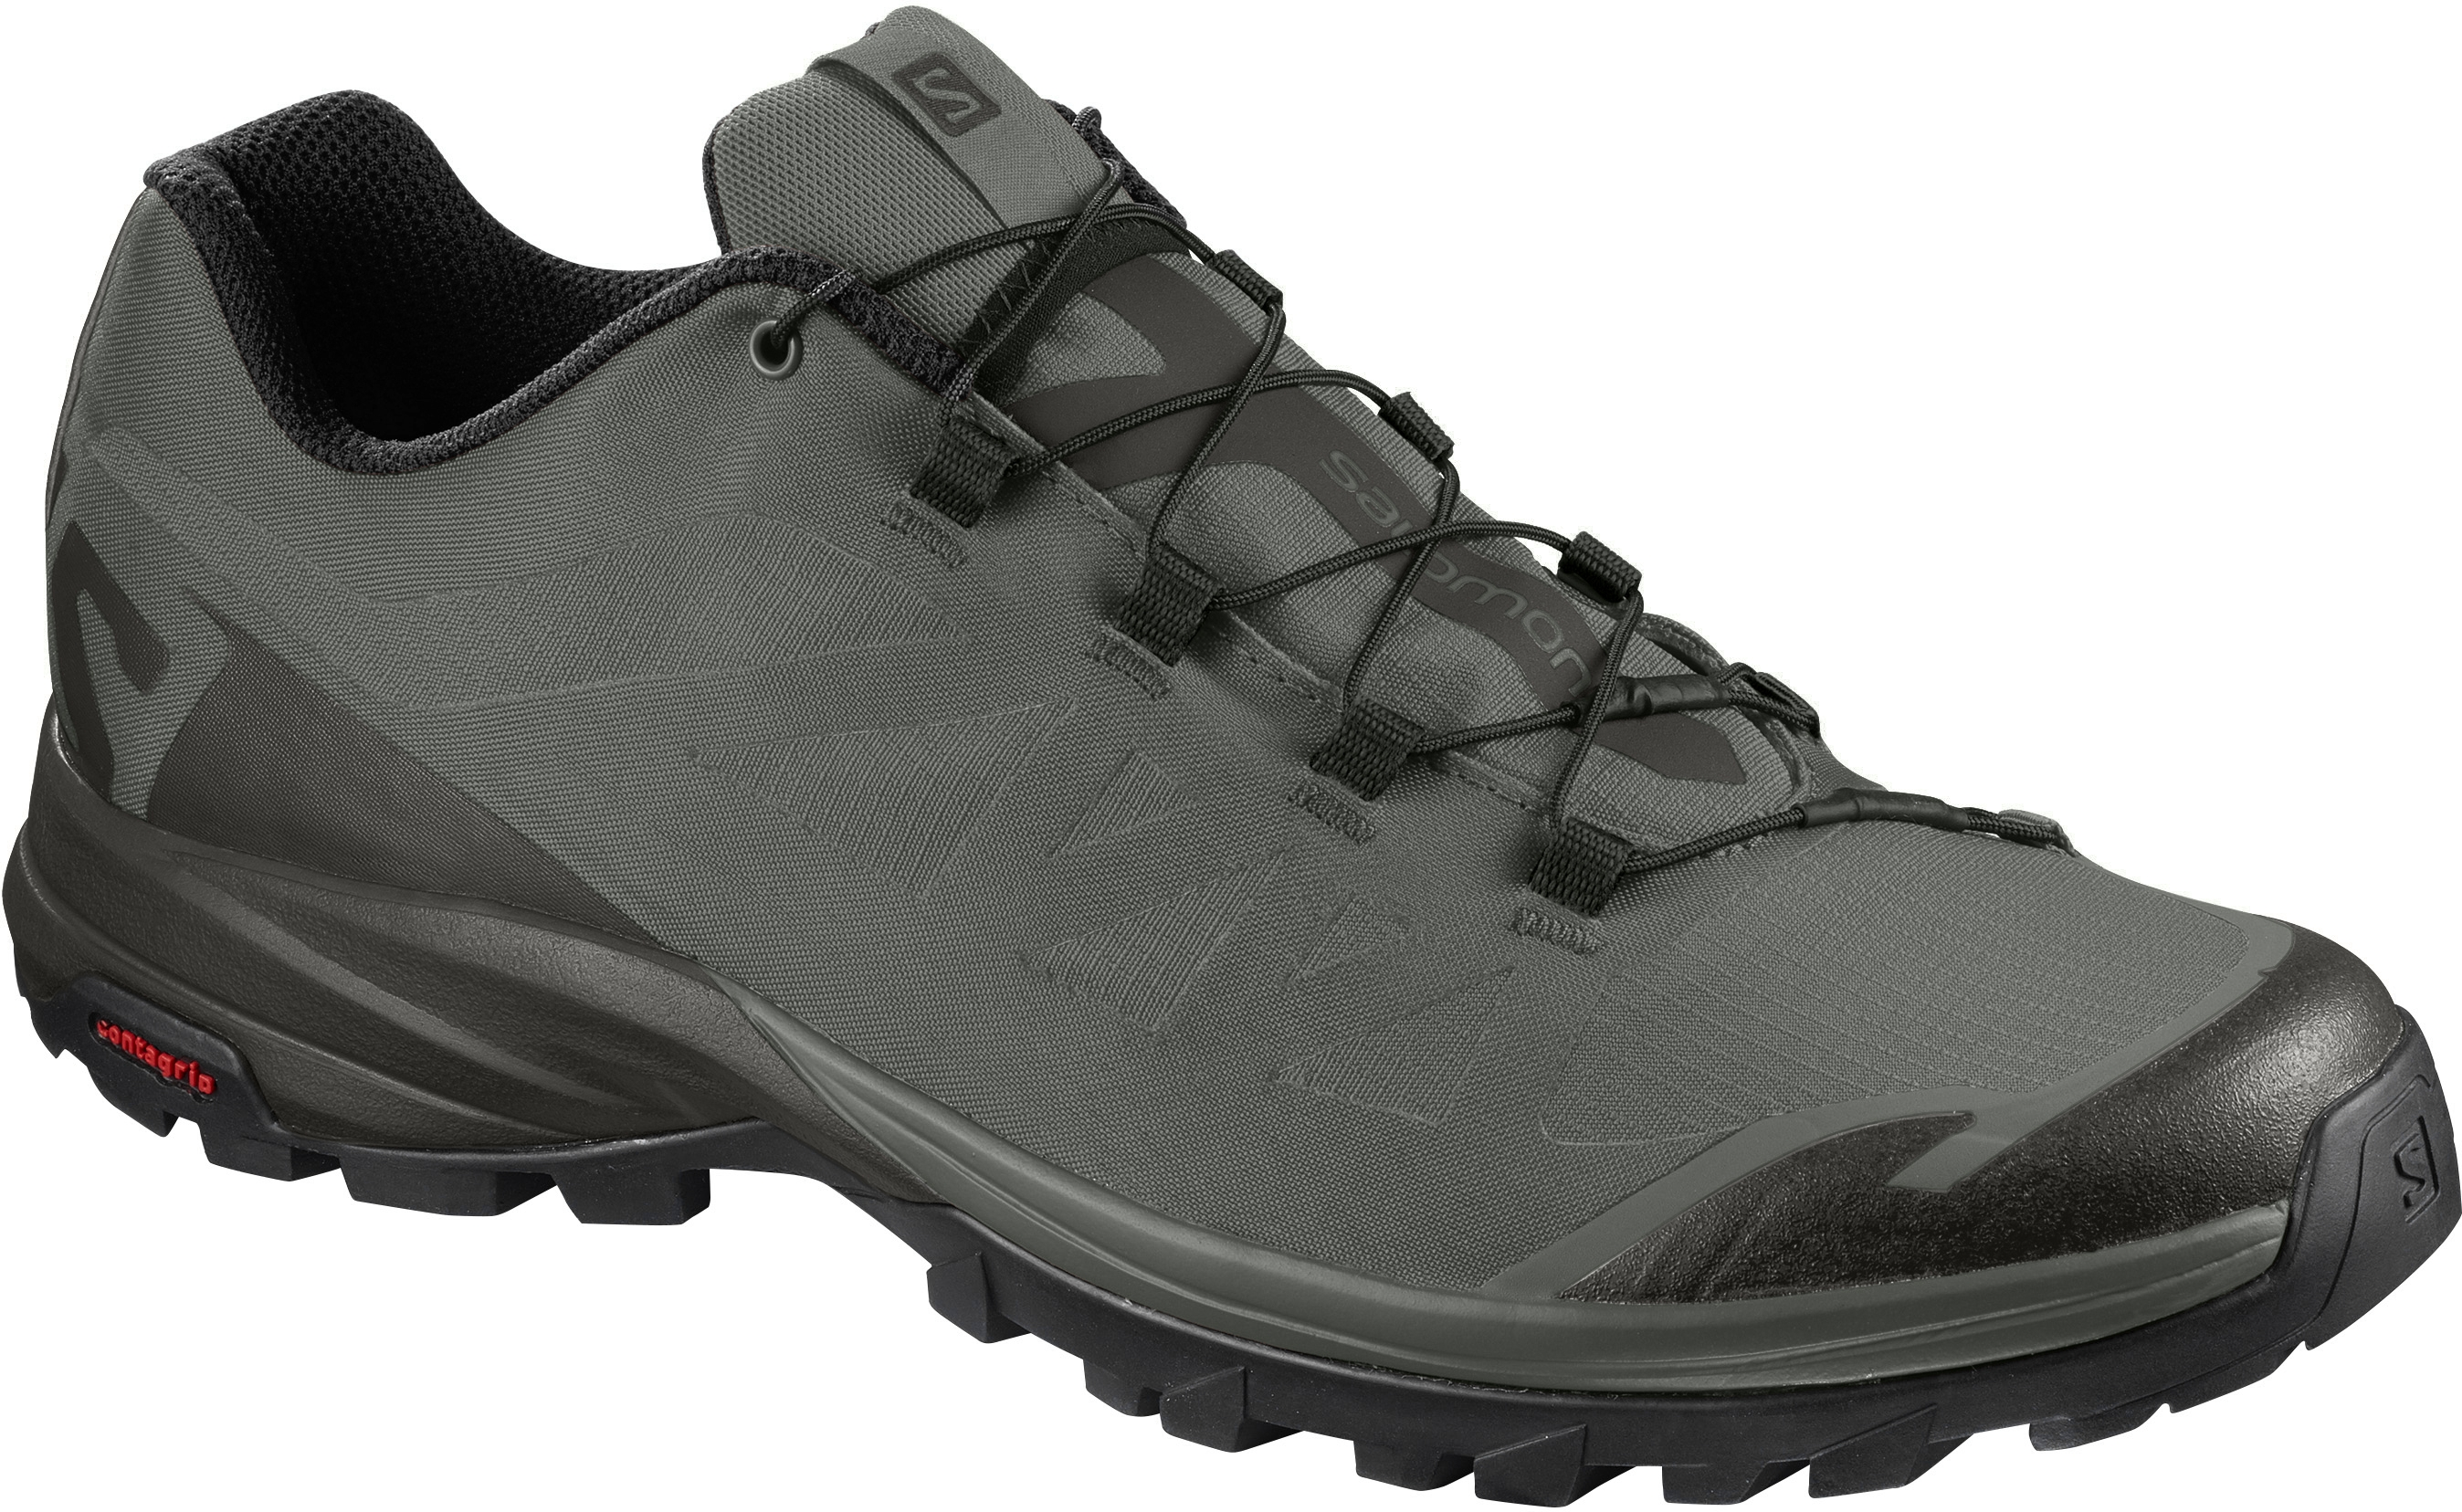 Salomon Outpath Chaussures Precision Randonnée Ski Beluga Grey BoQWrEdCxe